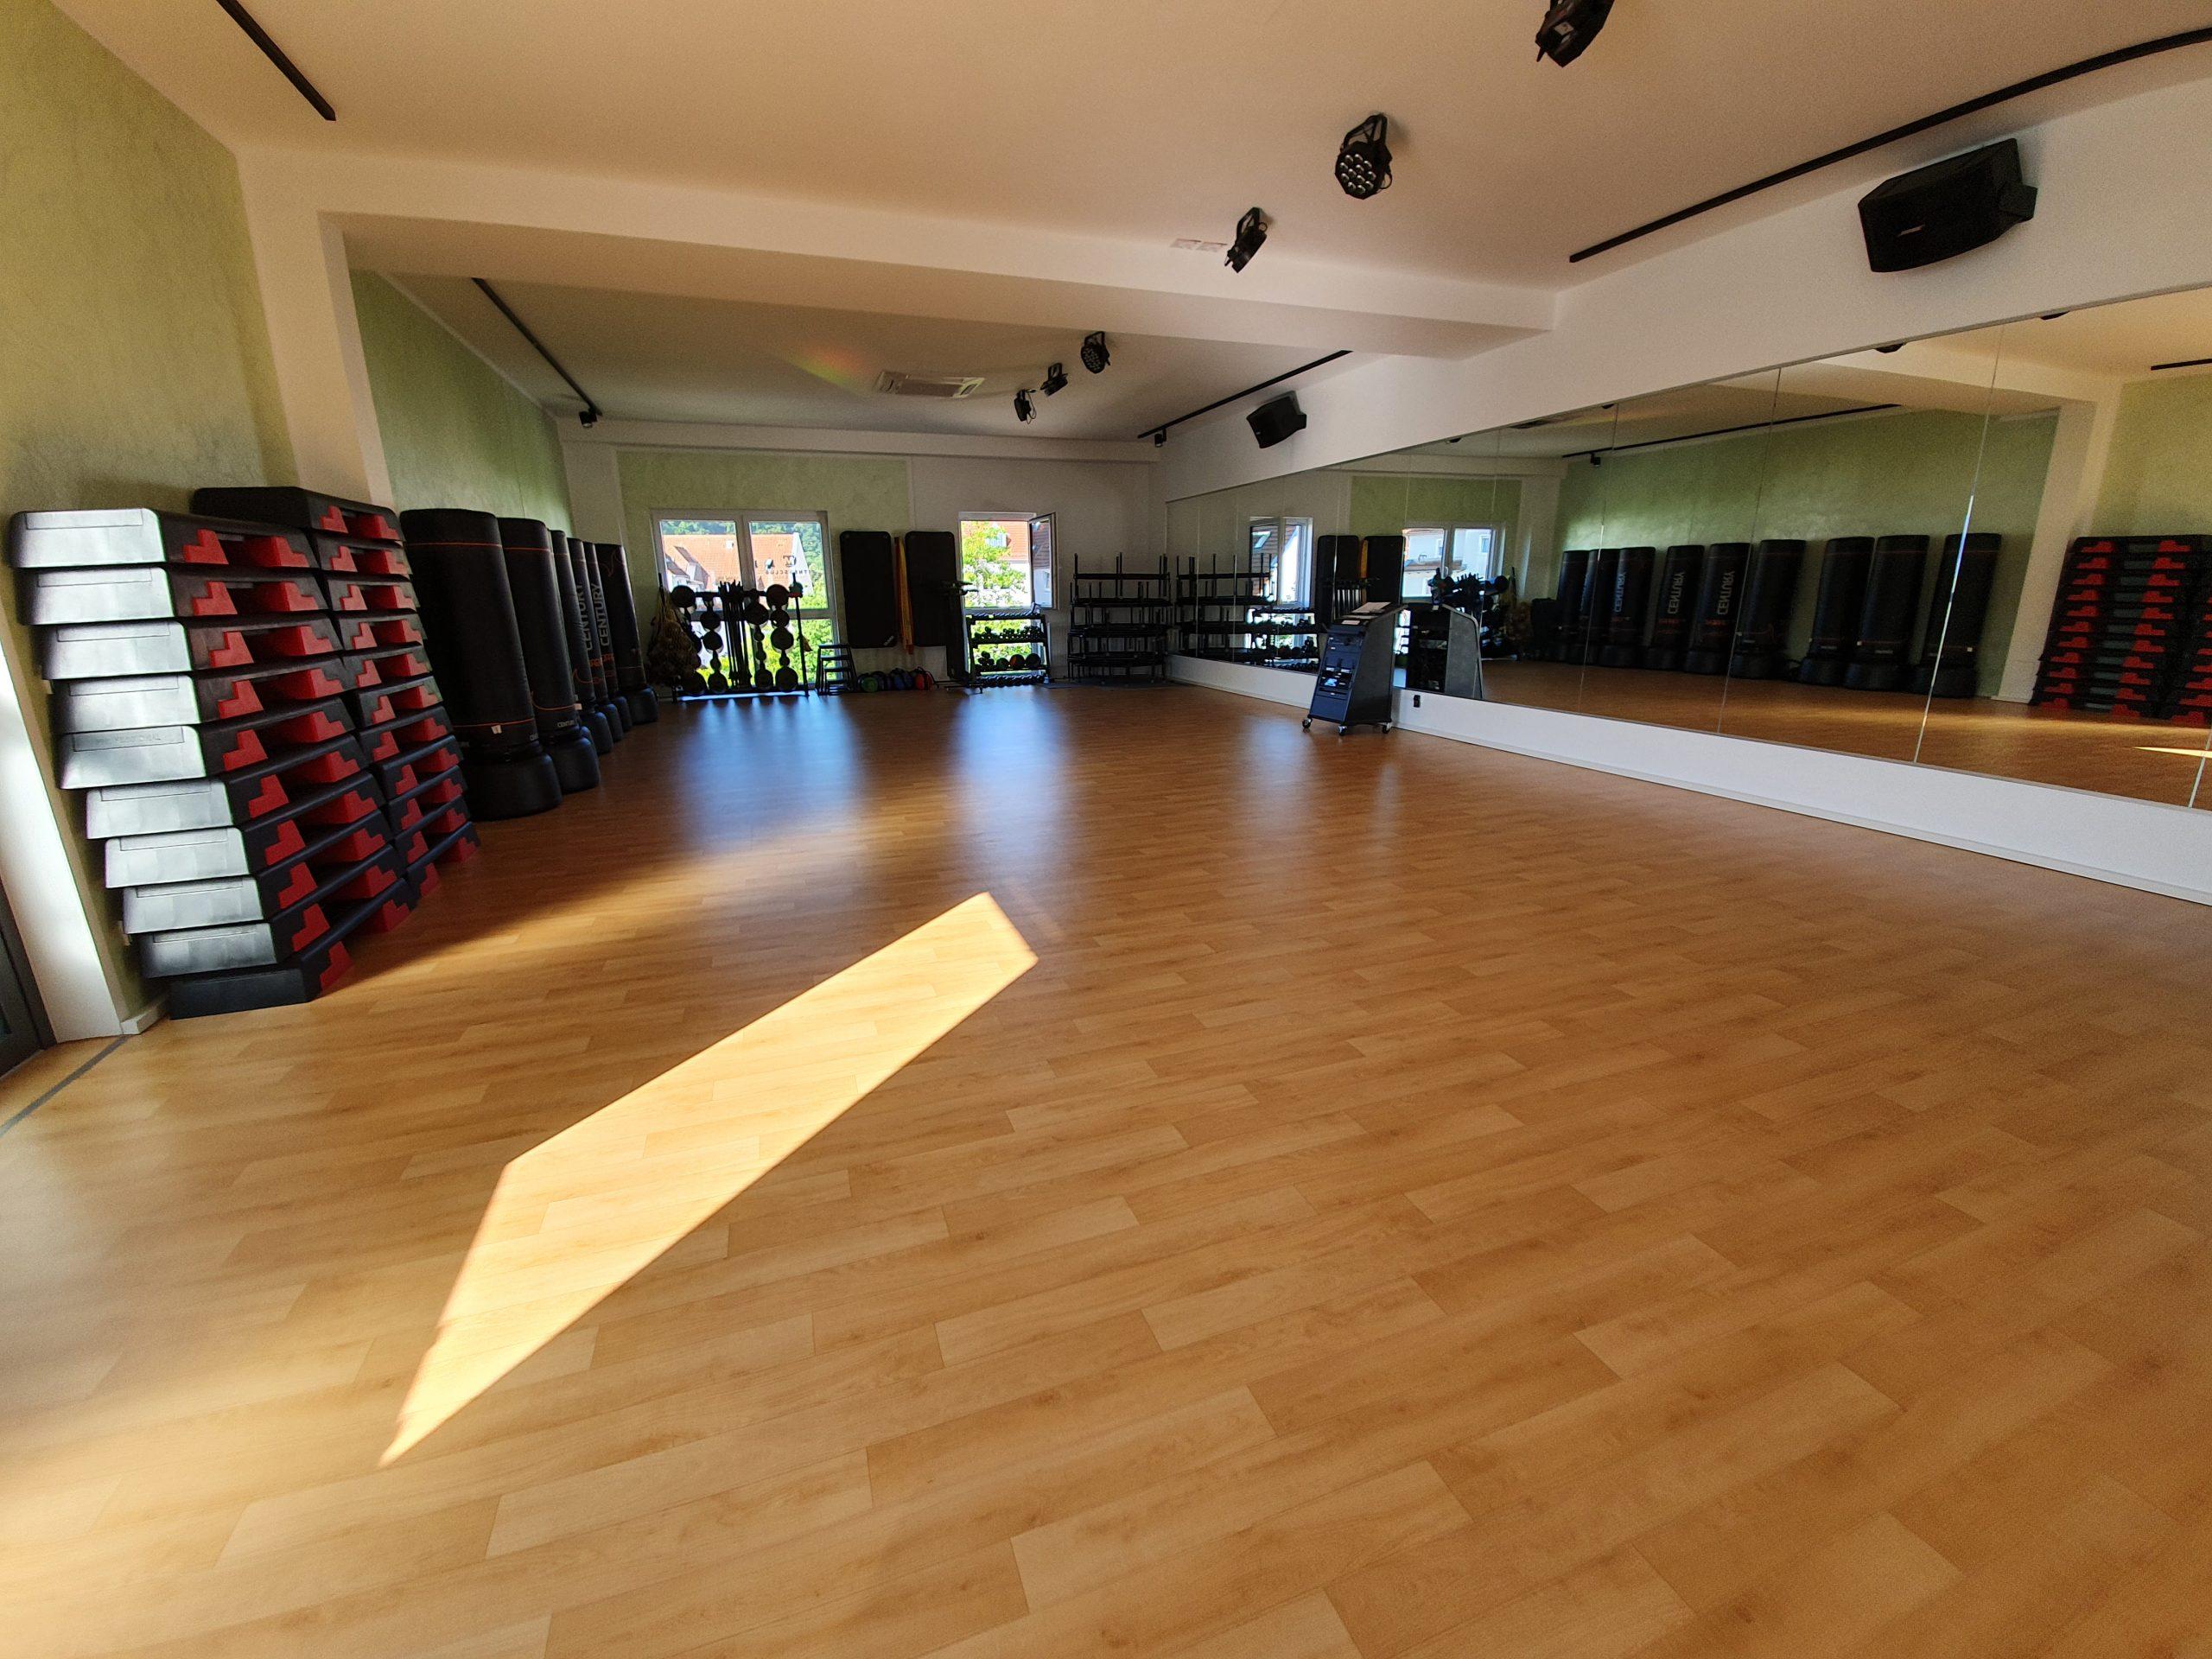 Rehasport in Nittendorf - T+M Fitnessclub Nittendorf